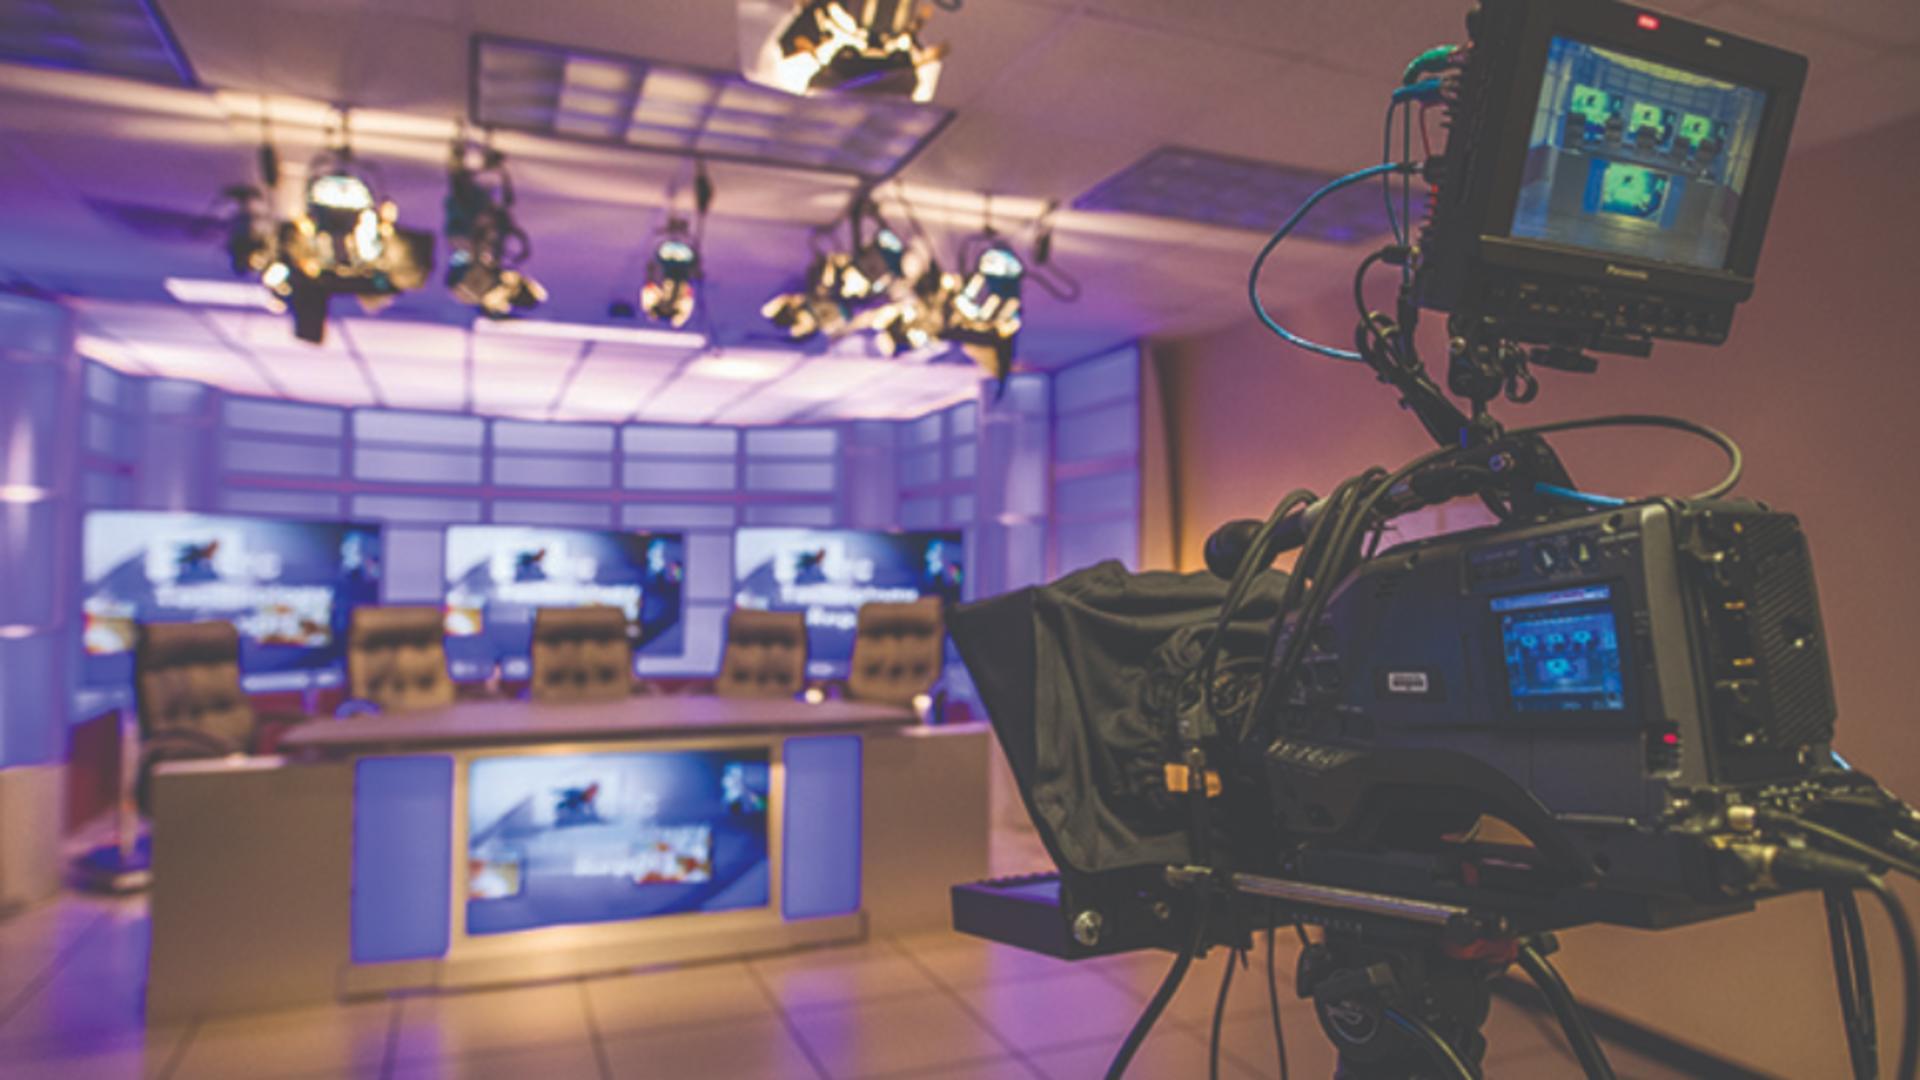 producție TV Foto ilustrativ